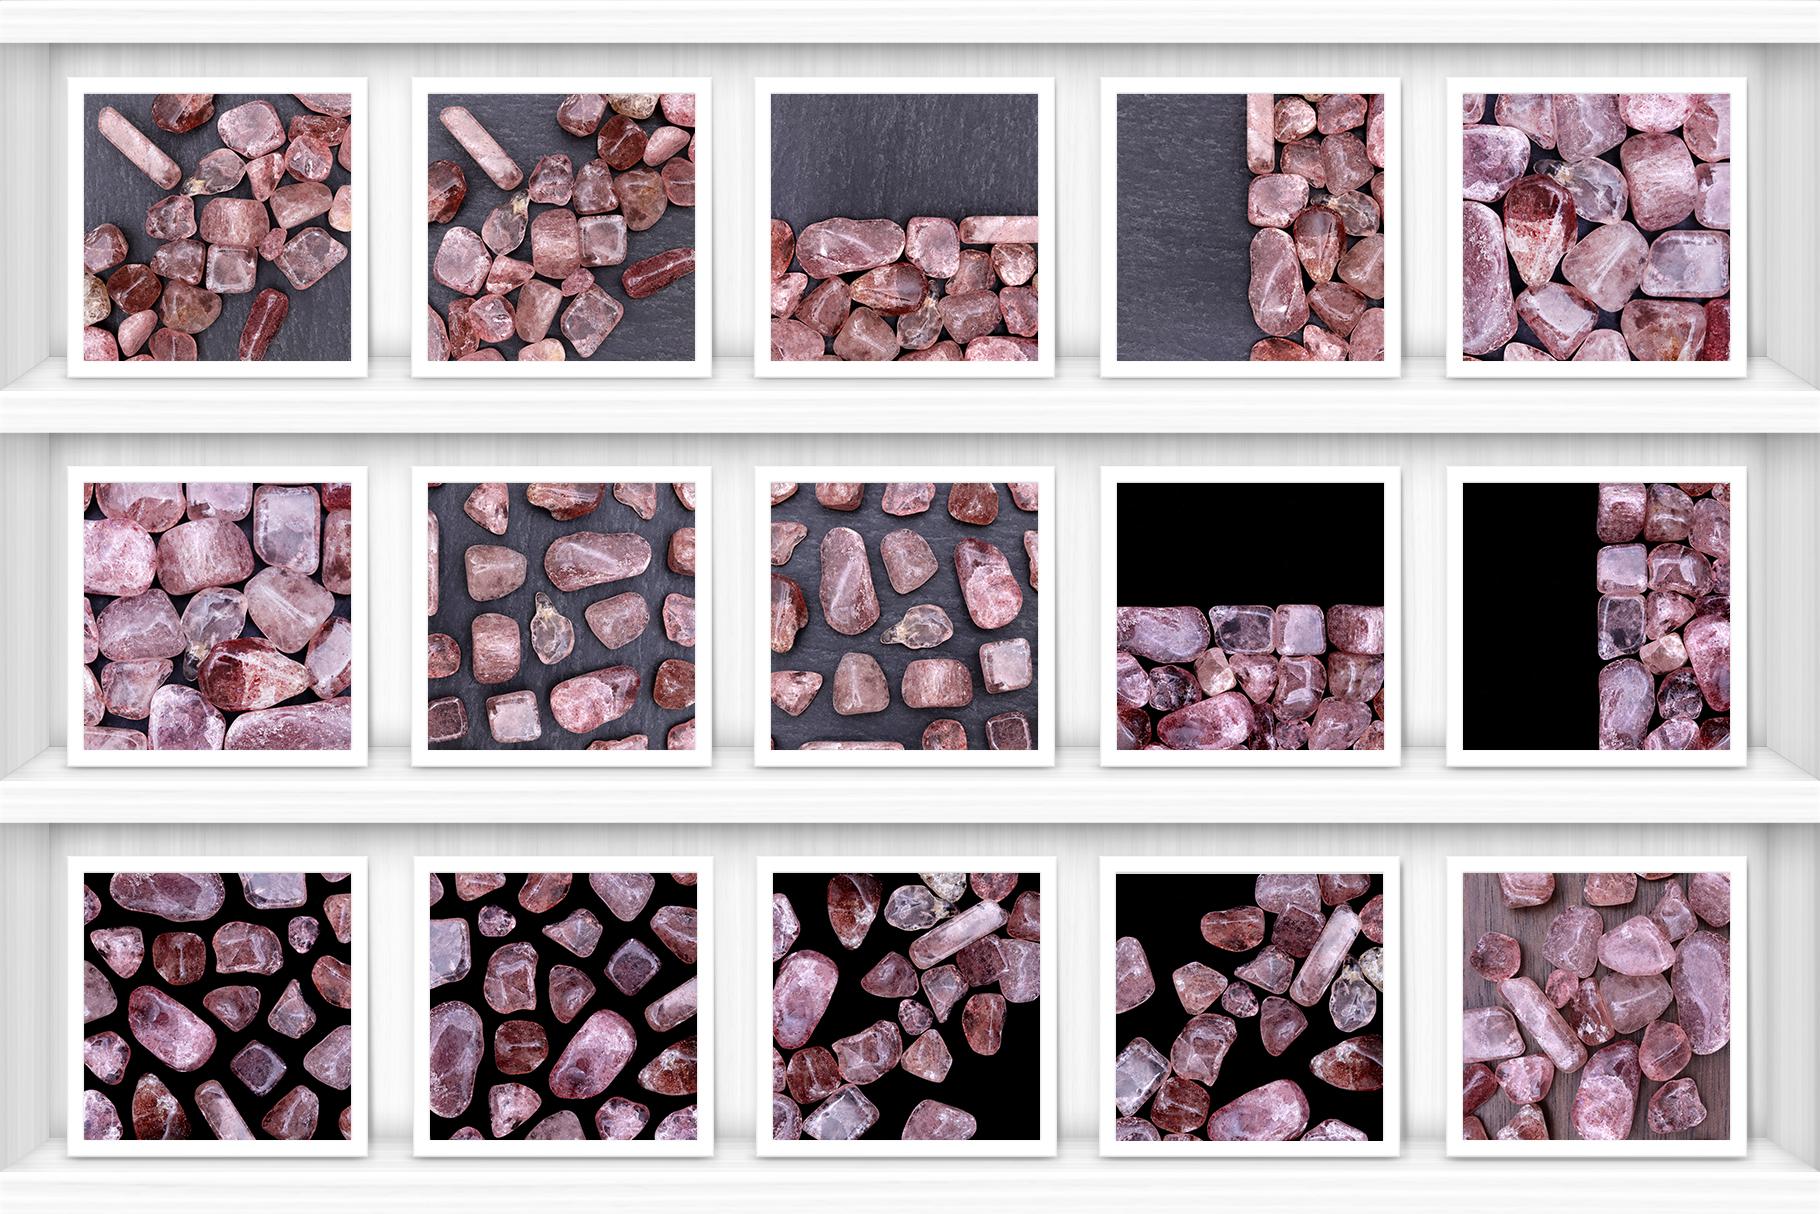 Strawberry Quartz Background Textures Showcase Shelves Samples Preview